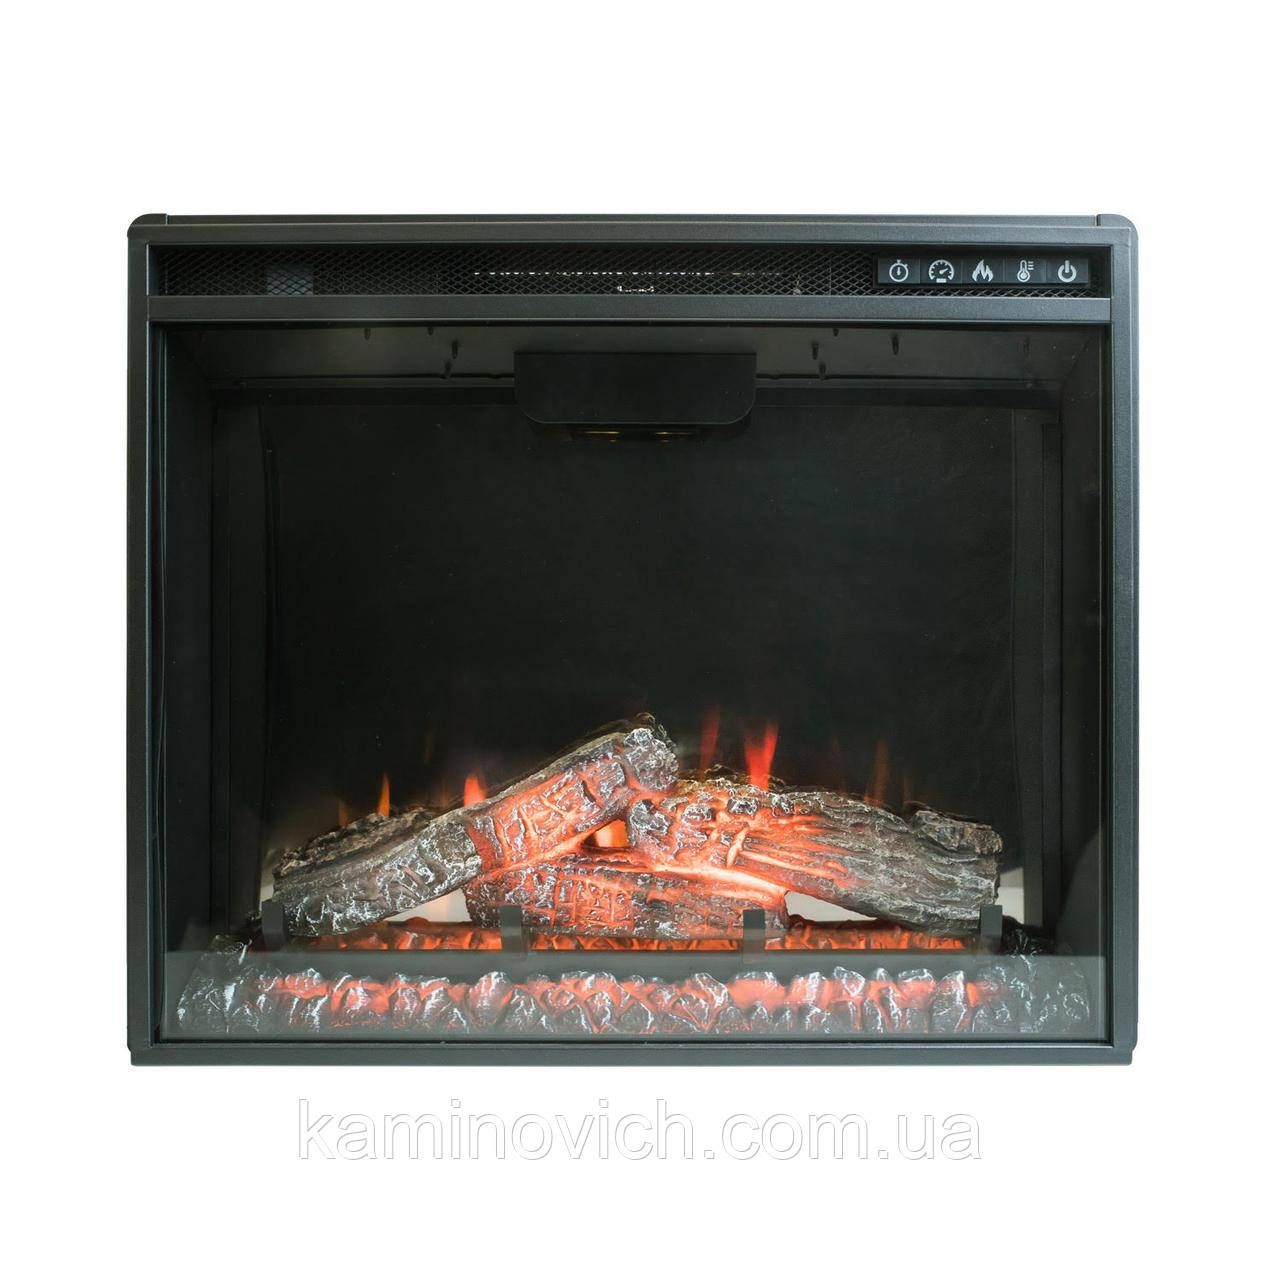 Электрический камин Bonfire Jupiter 26 A